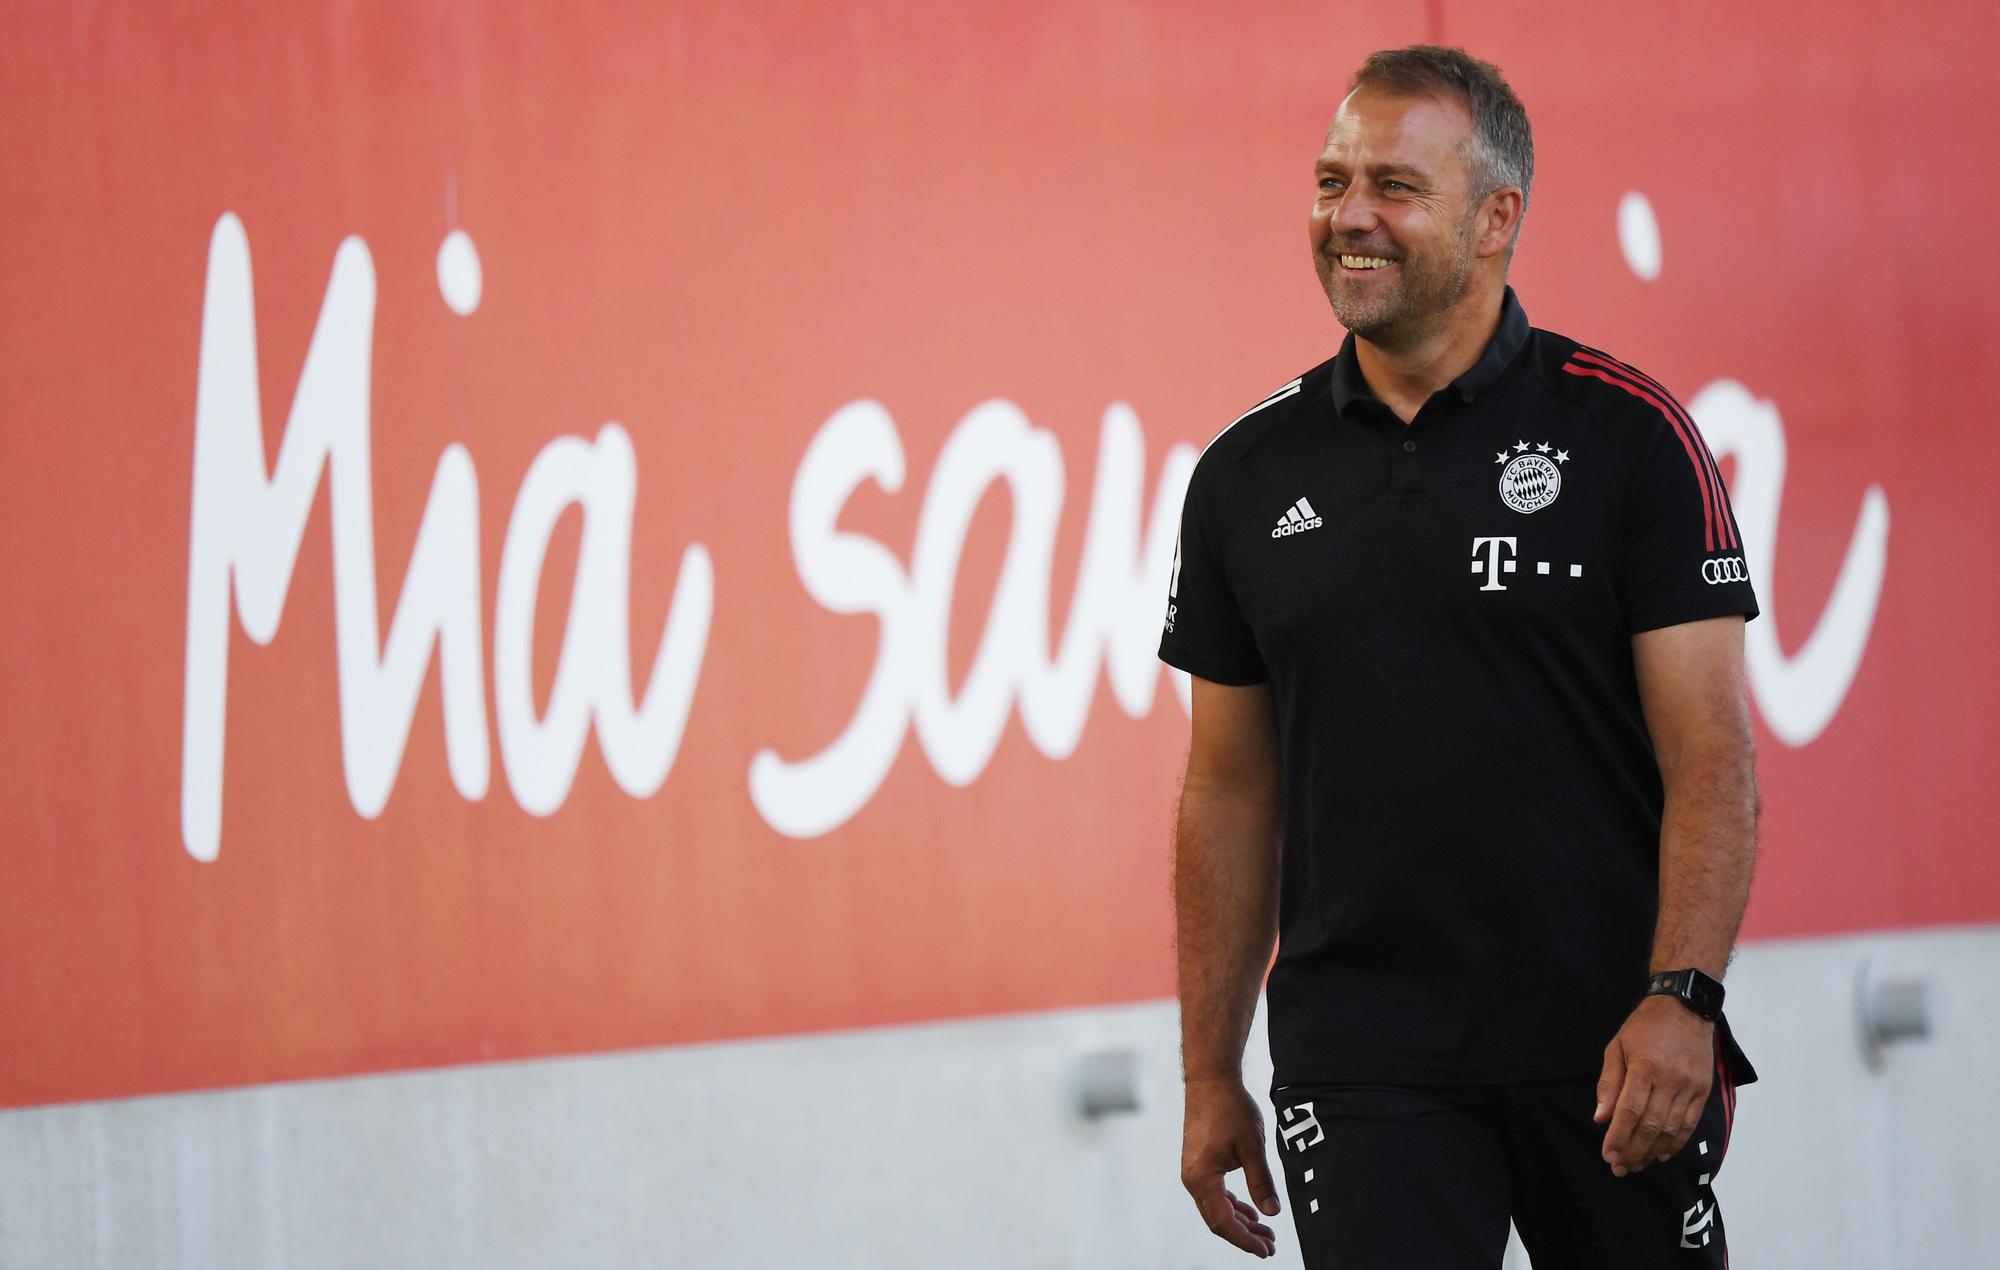 Trainer Bayern